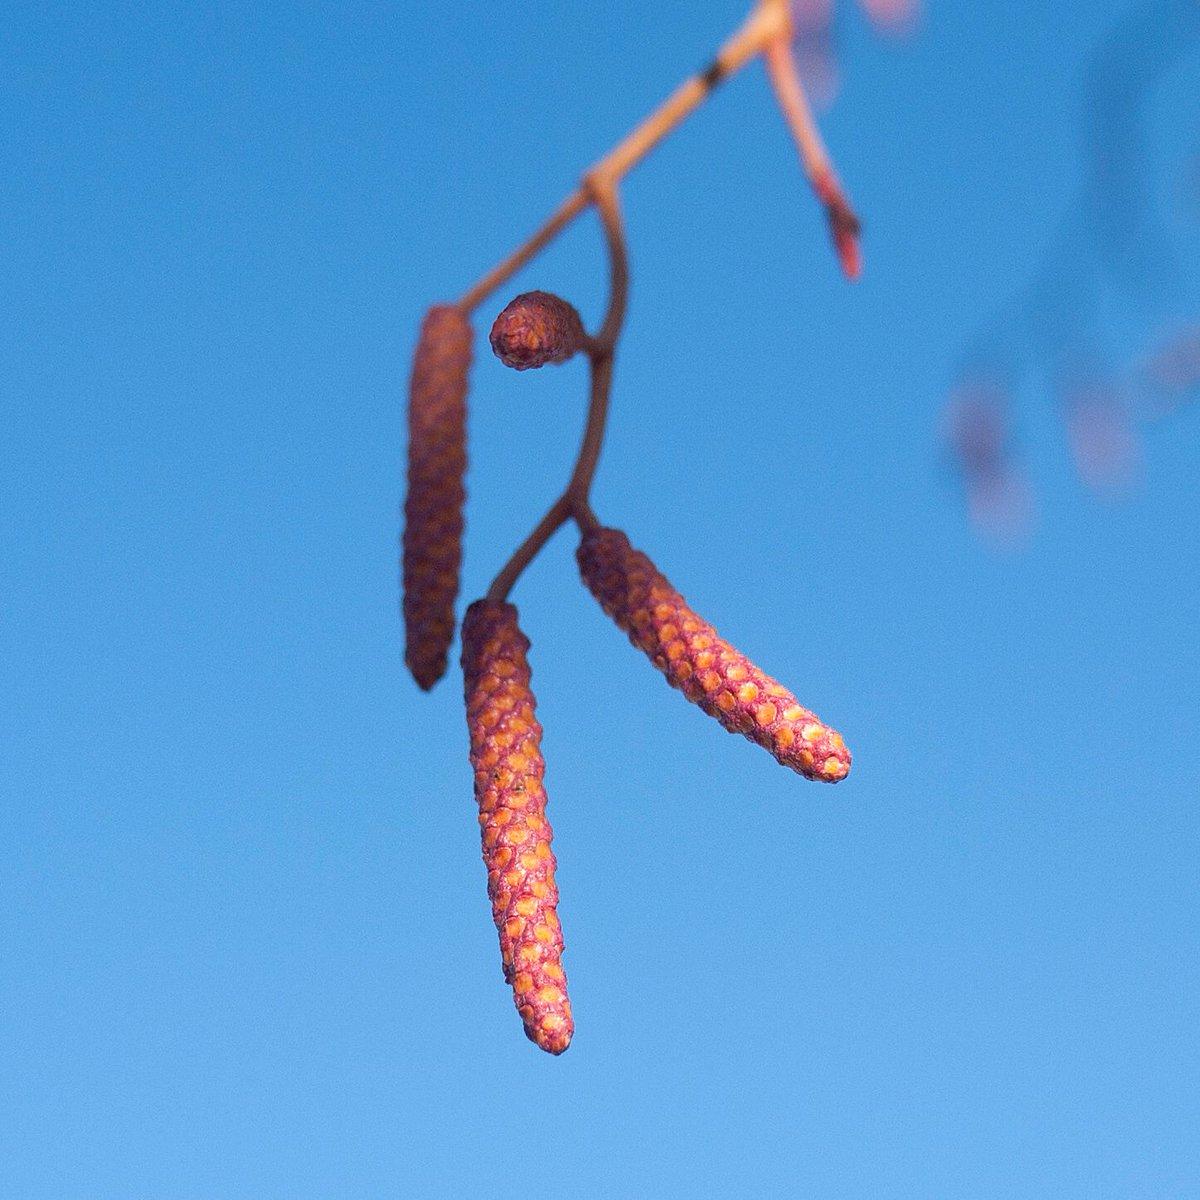 Golden Alder Alnus Incana Aurea Is A Streettree With Potential Great Winter Colour Pic Twitter Vvaqak98kg